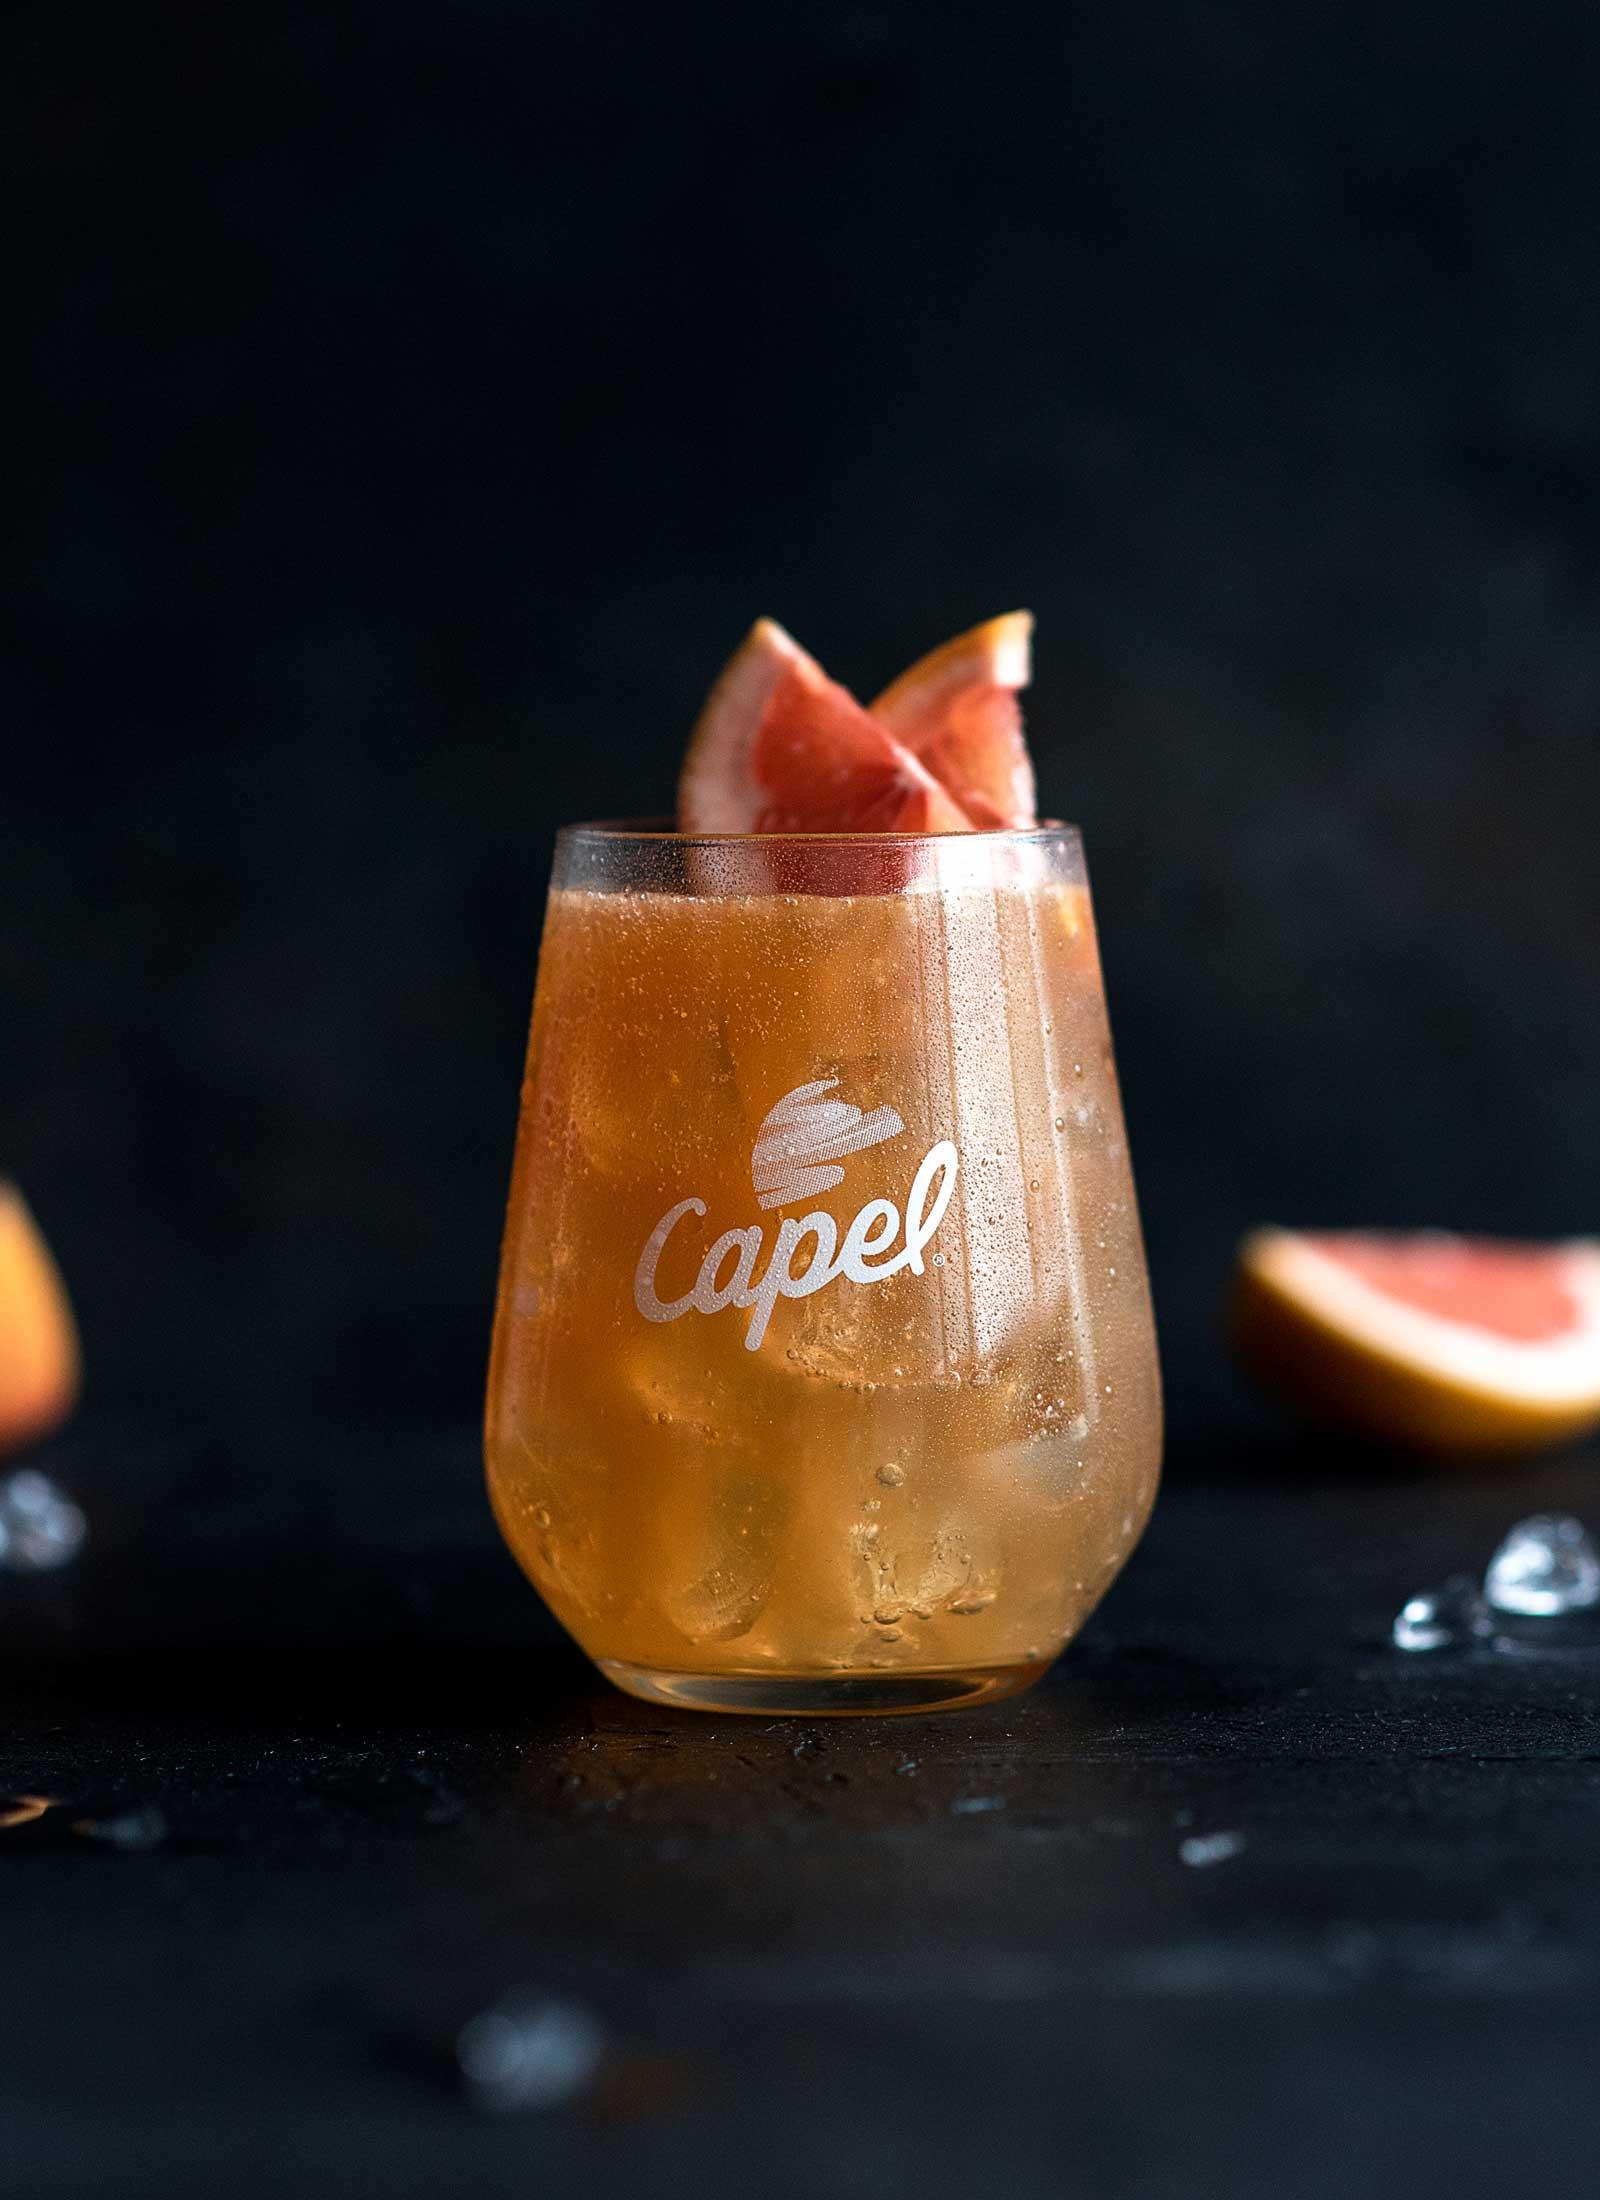 cocktail-capel-jigger-estudio-como